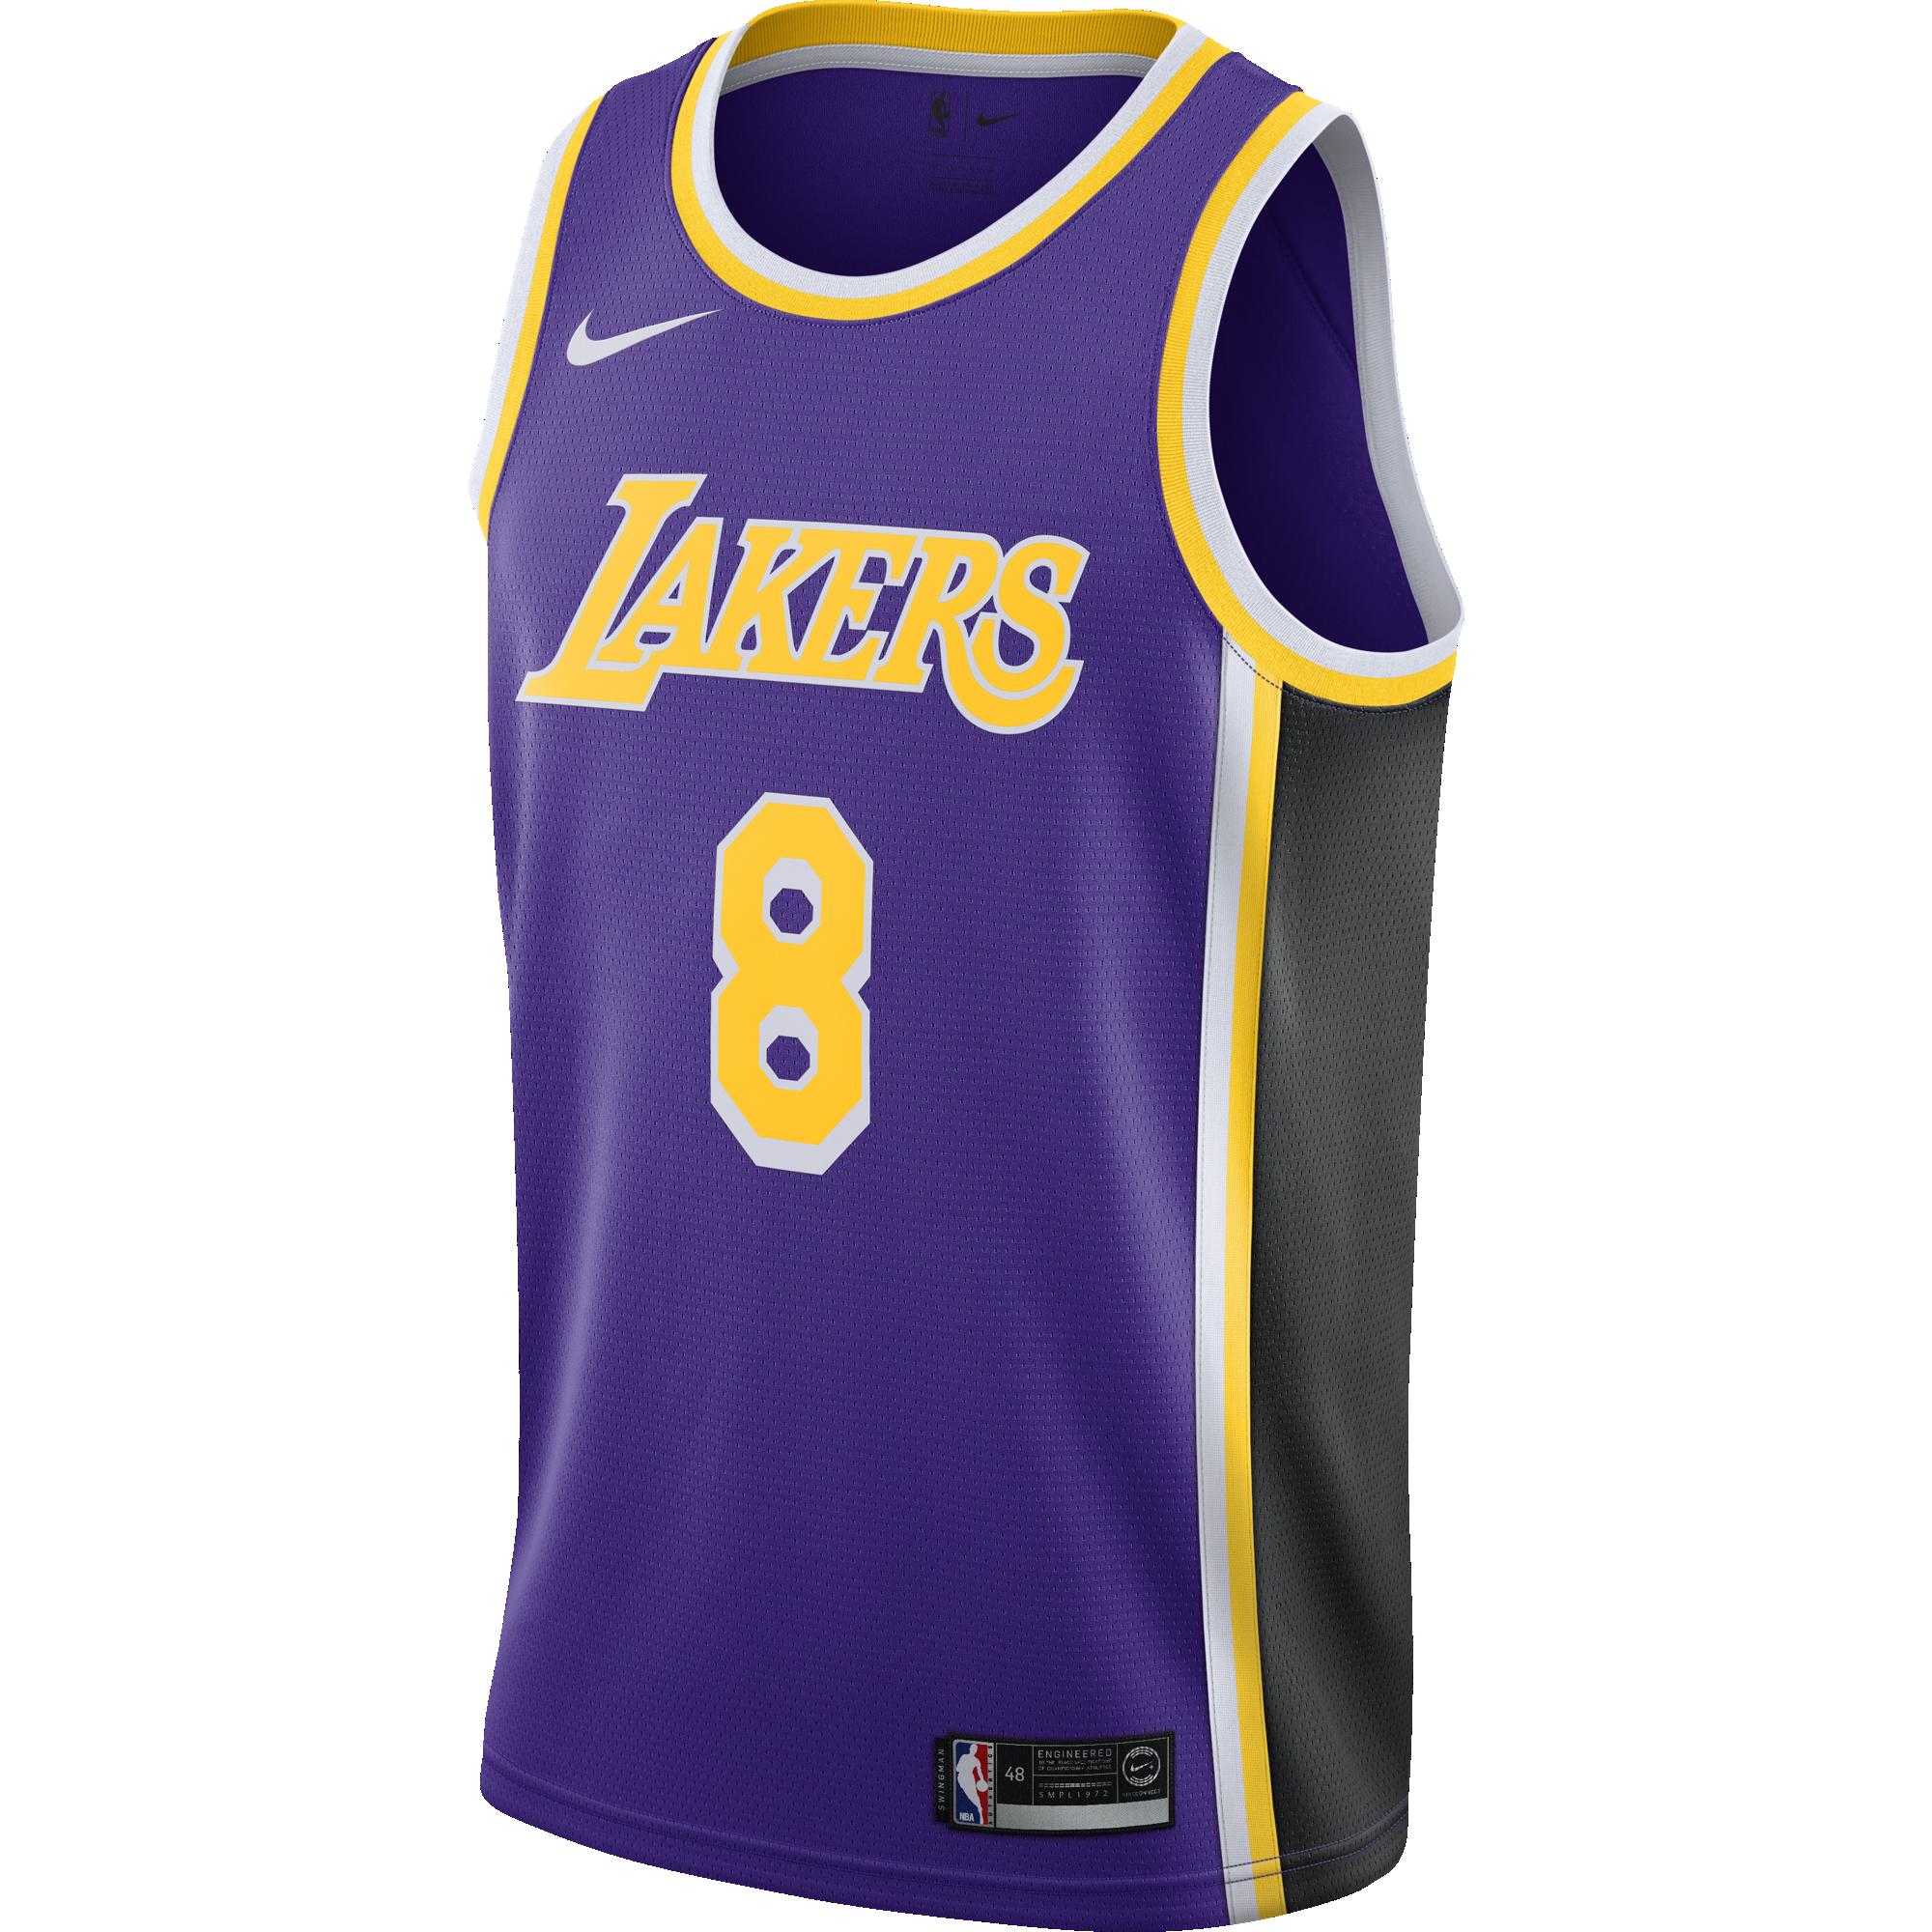 25d394b11 NBA LOS ANGELES LAKERS KOBE BRYANT SWINGMAN JERSEY for £80.00 ...